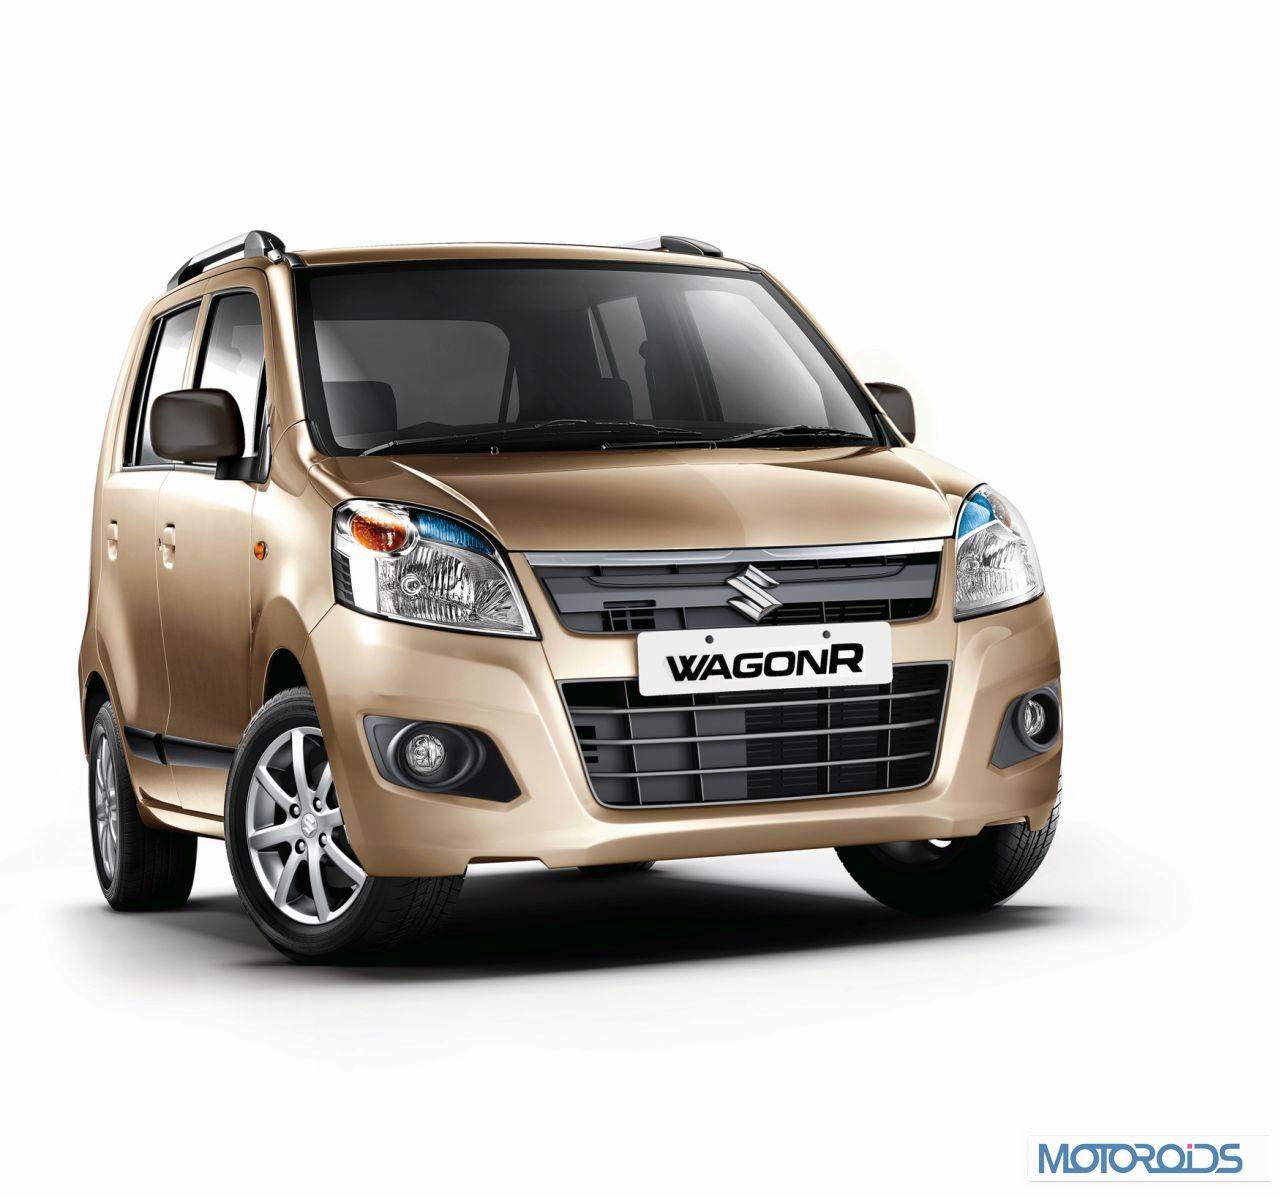 maruti suzuki wagon r zooms past 15 lakh sales mark. Black Bedroom Furniture Sets. Home Design Ideas